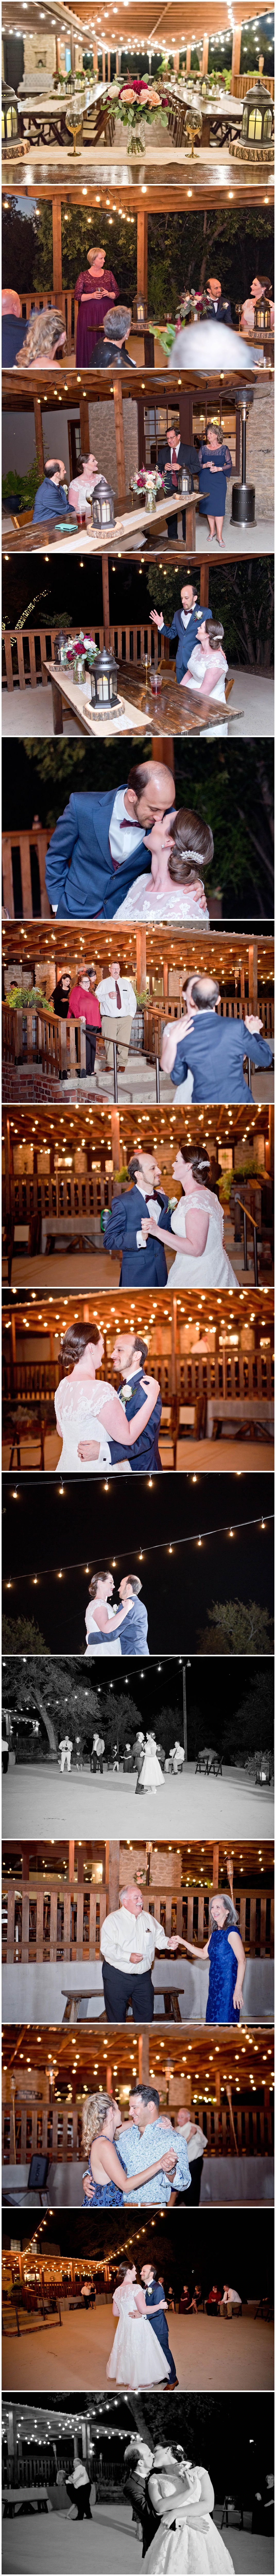 dancing under the stars wedding reception fort worth texas